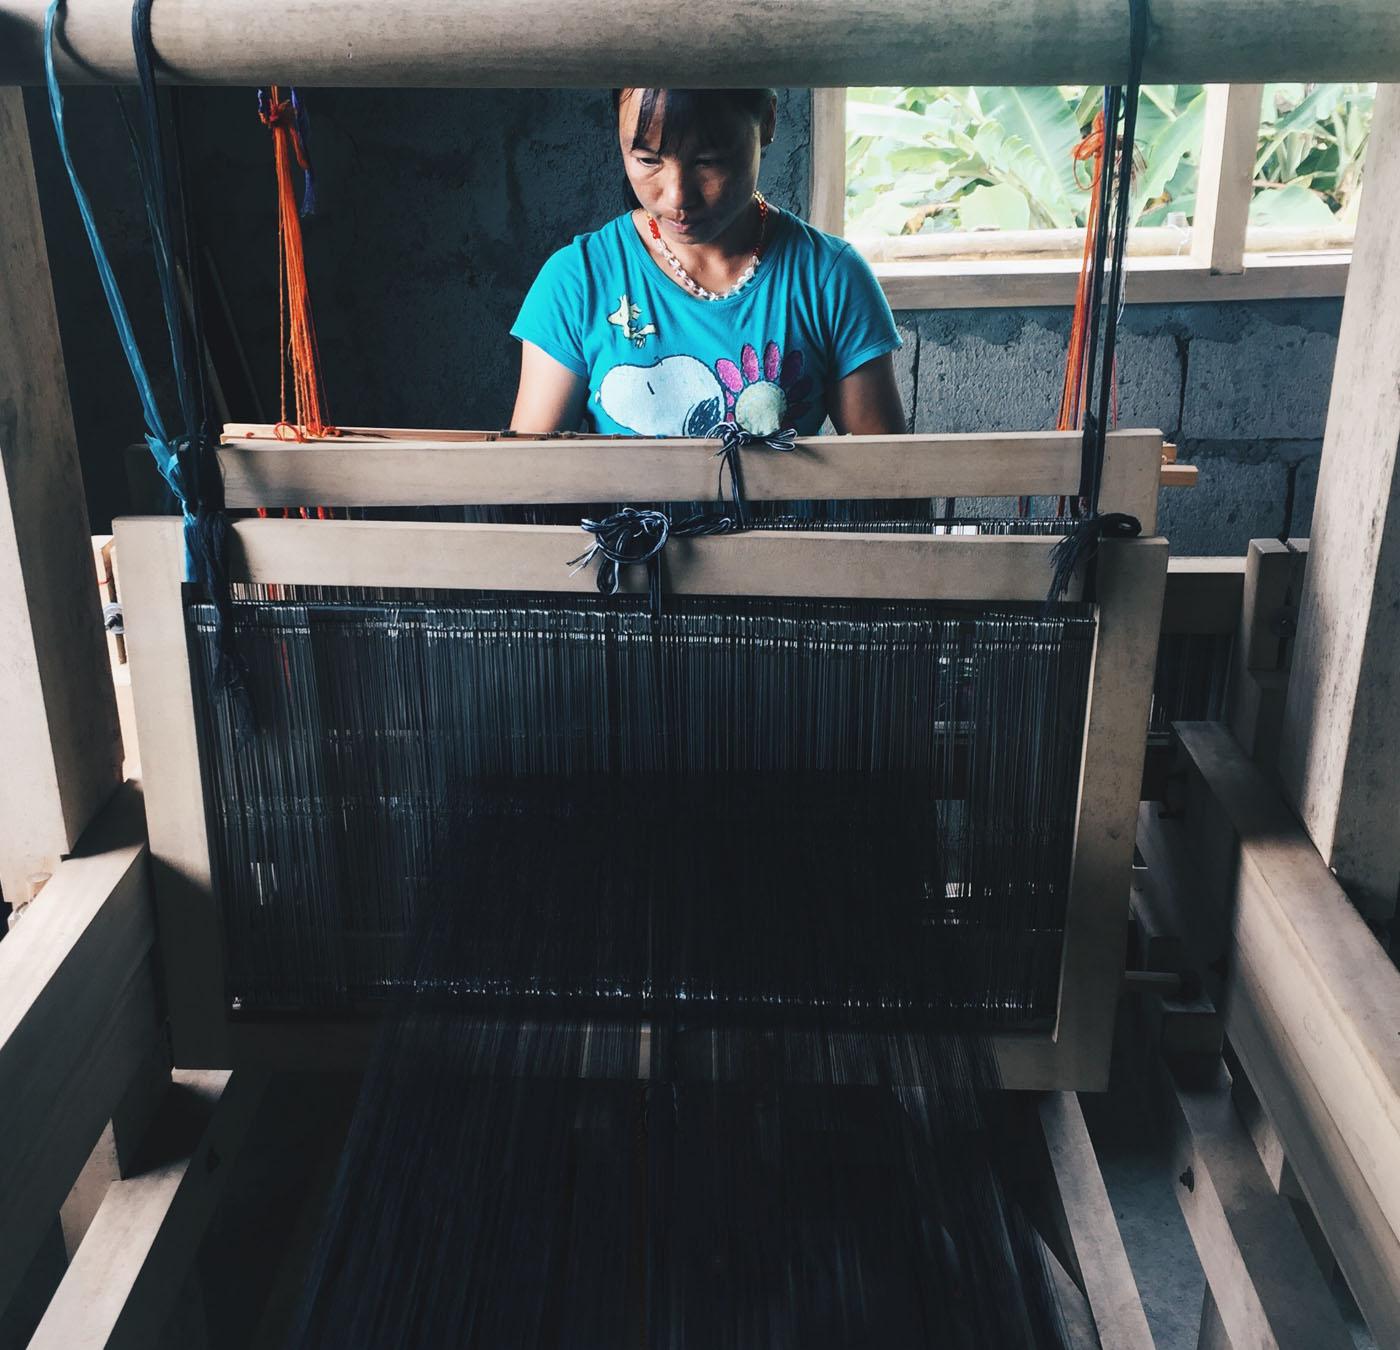 IFUGAO WEAVING. One of the few Ifugao women who continue to practice loom weaving. All photos by Joco Calimlim